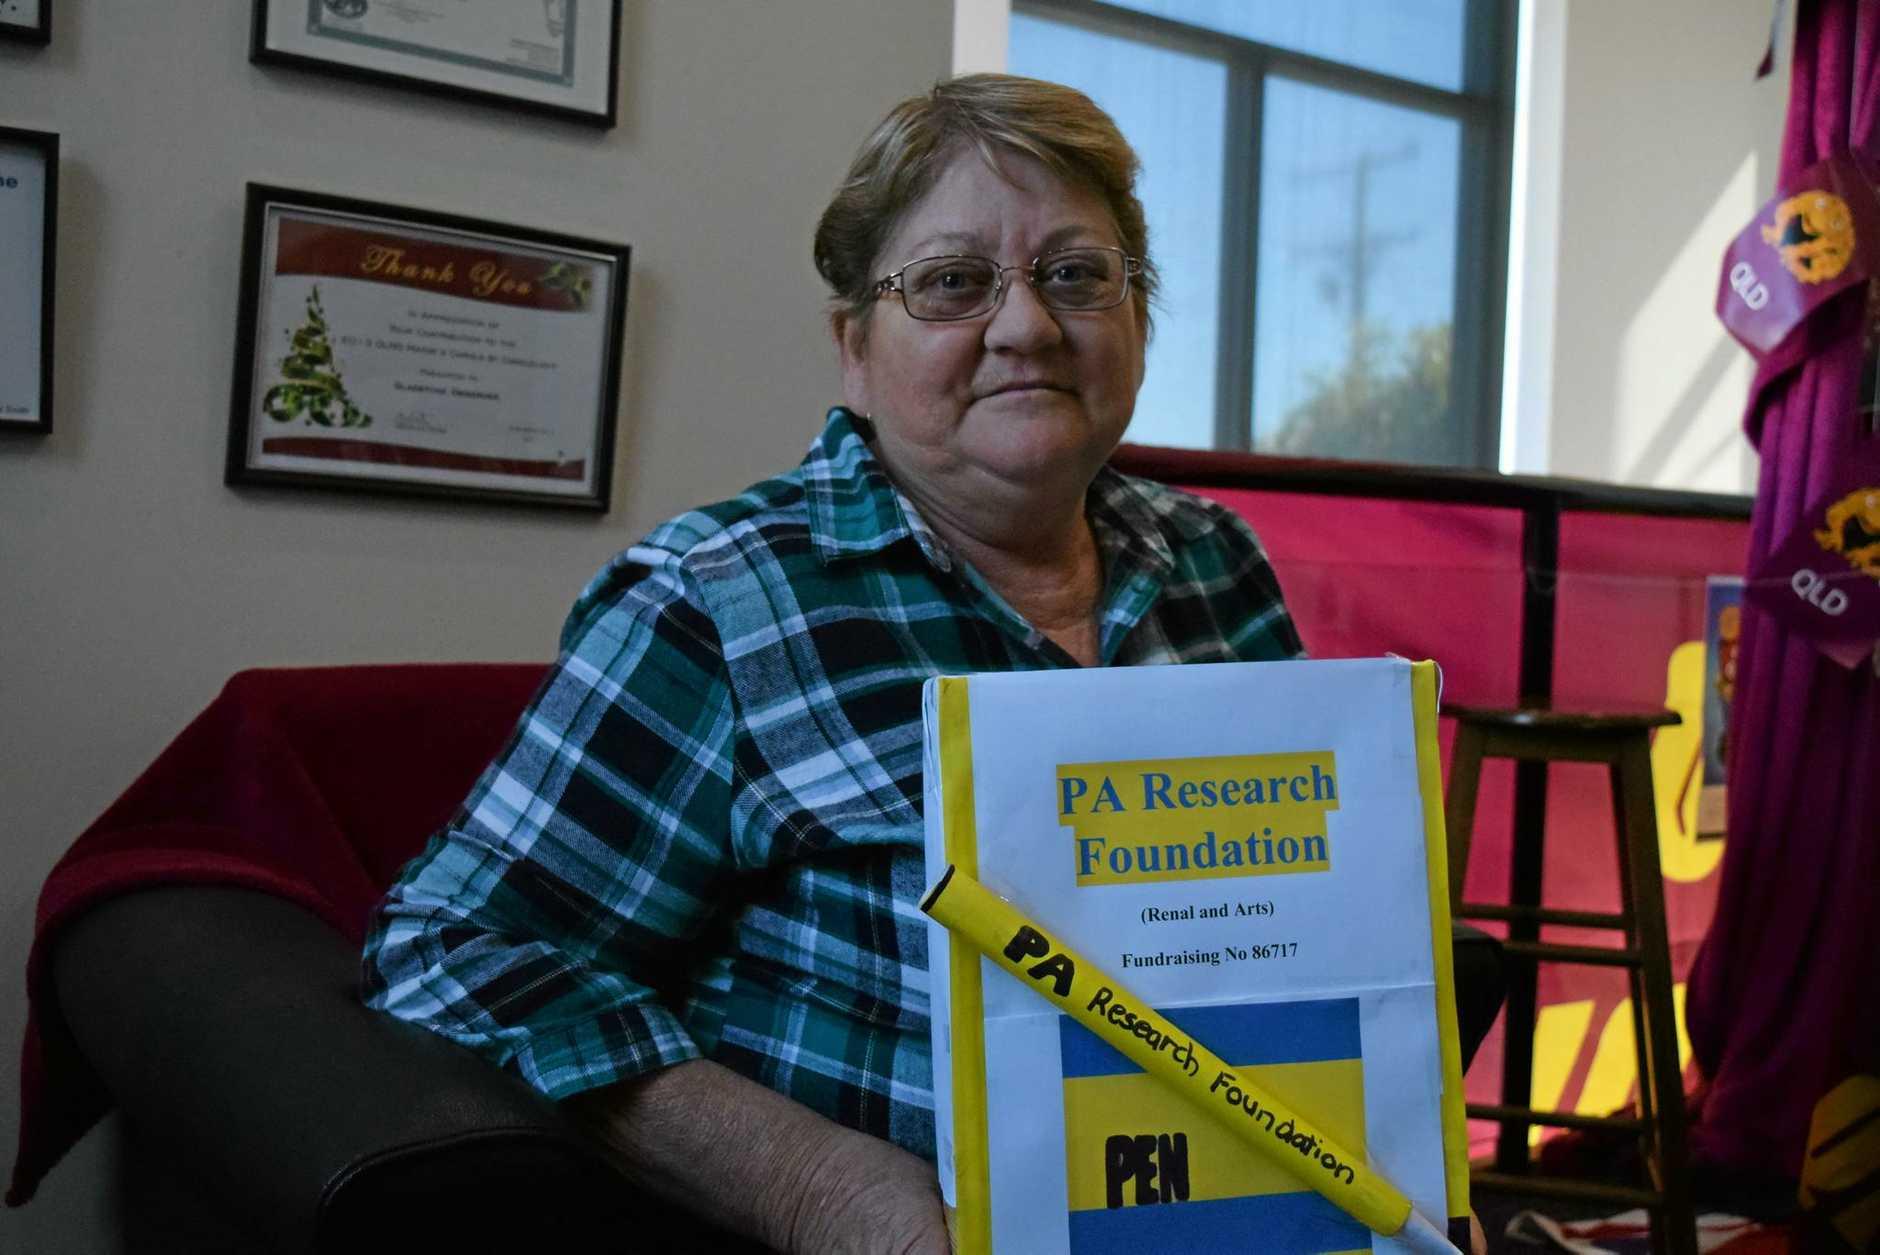 Gladstone resident Sandra Mullings has Autosomal Dominant Tubulointerstitial Kidney Disease. (INSET) Sandra Mulling's with her siblings, Linda Reid, Helen Thompson, Adam Hayward and Patty Kent.